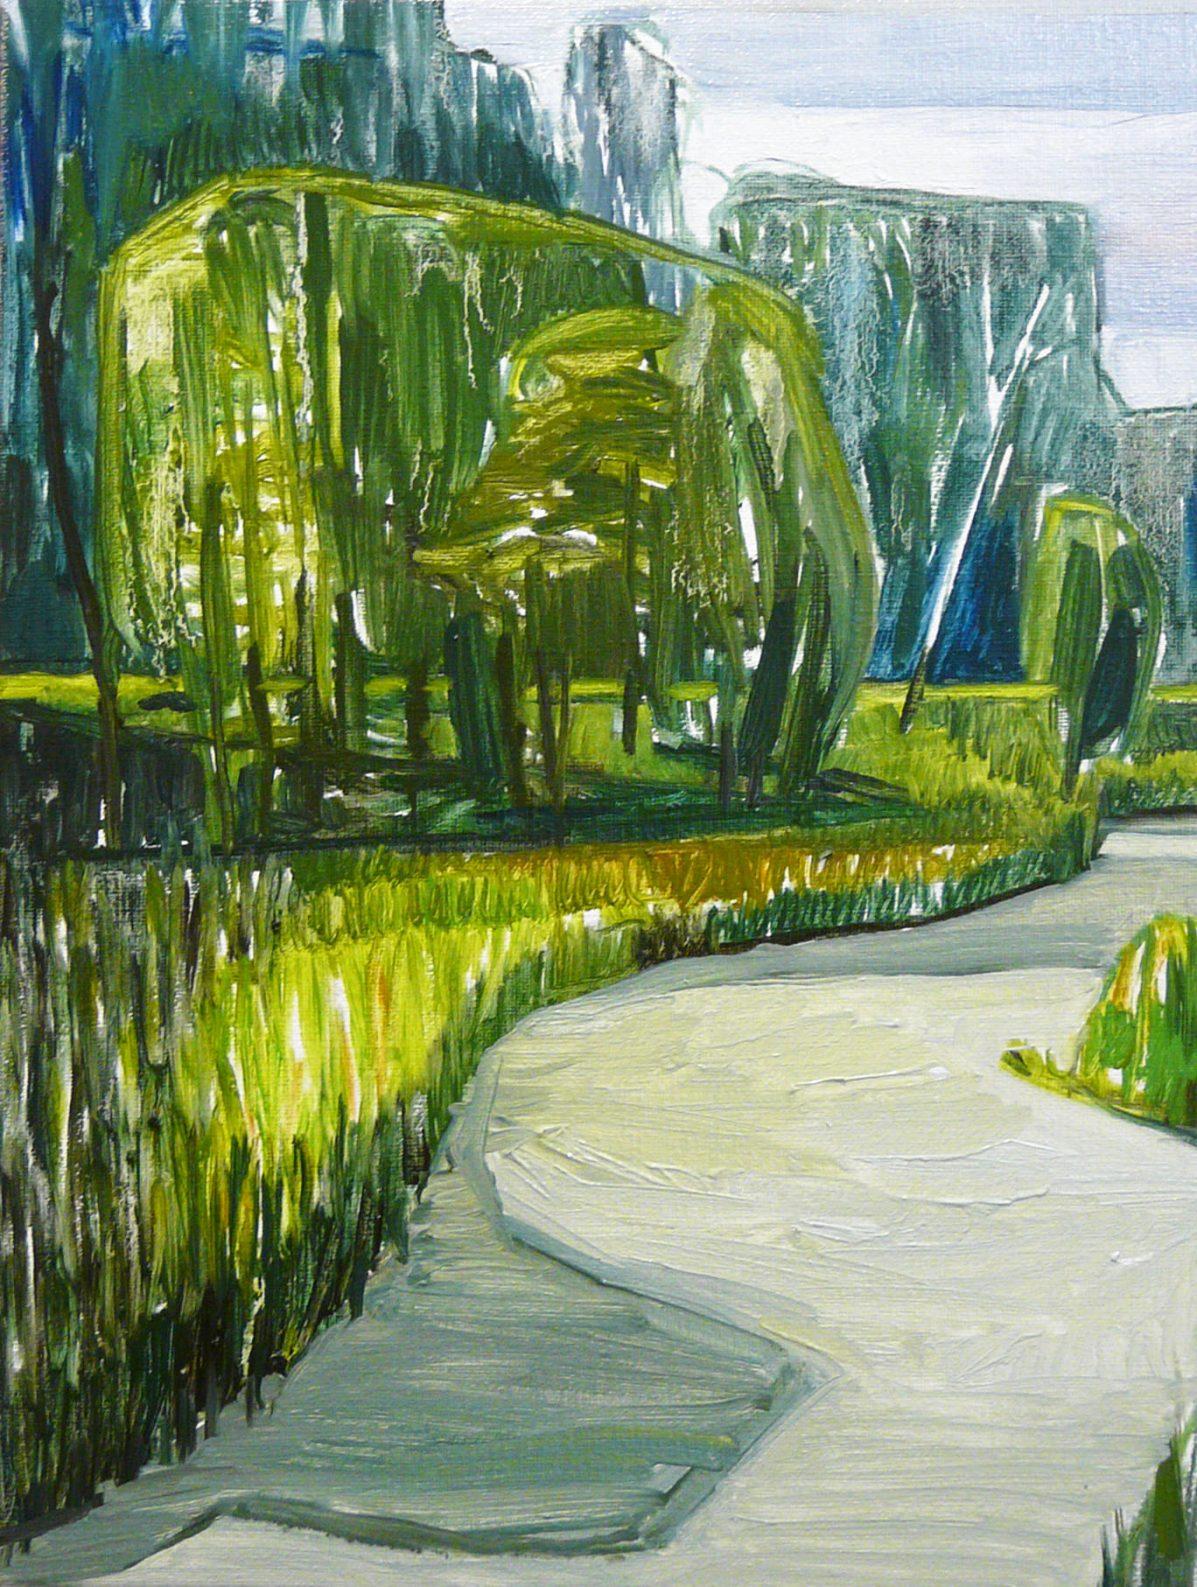 Green Landscape 1-10_2015_40 x 30cm